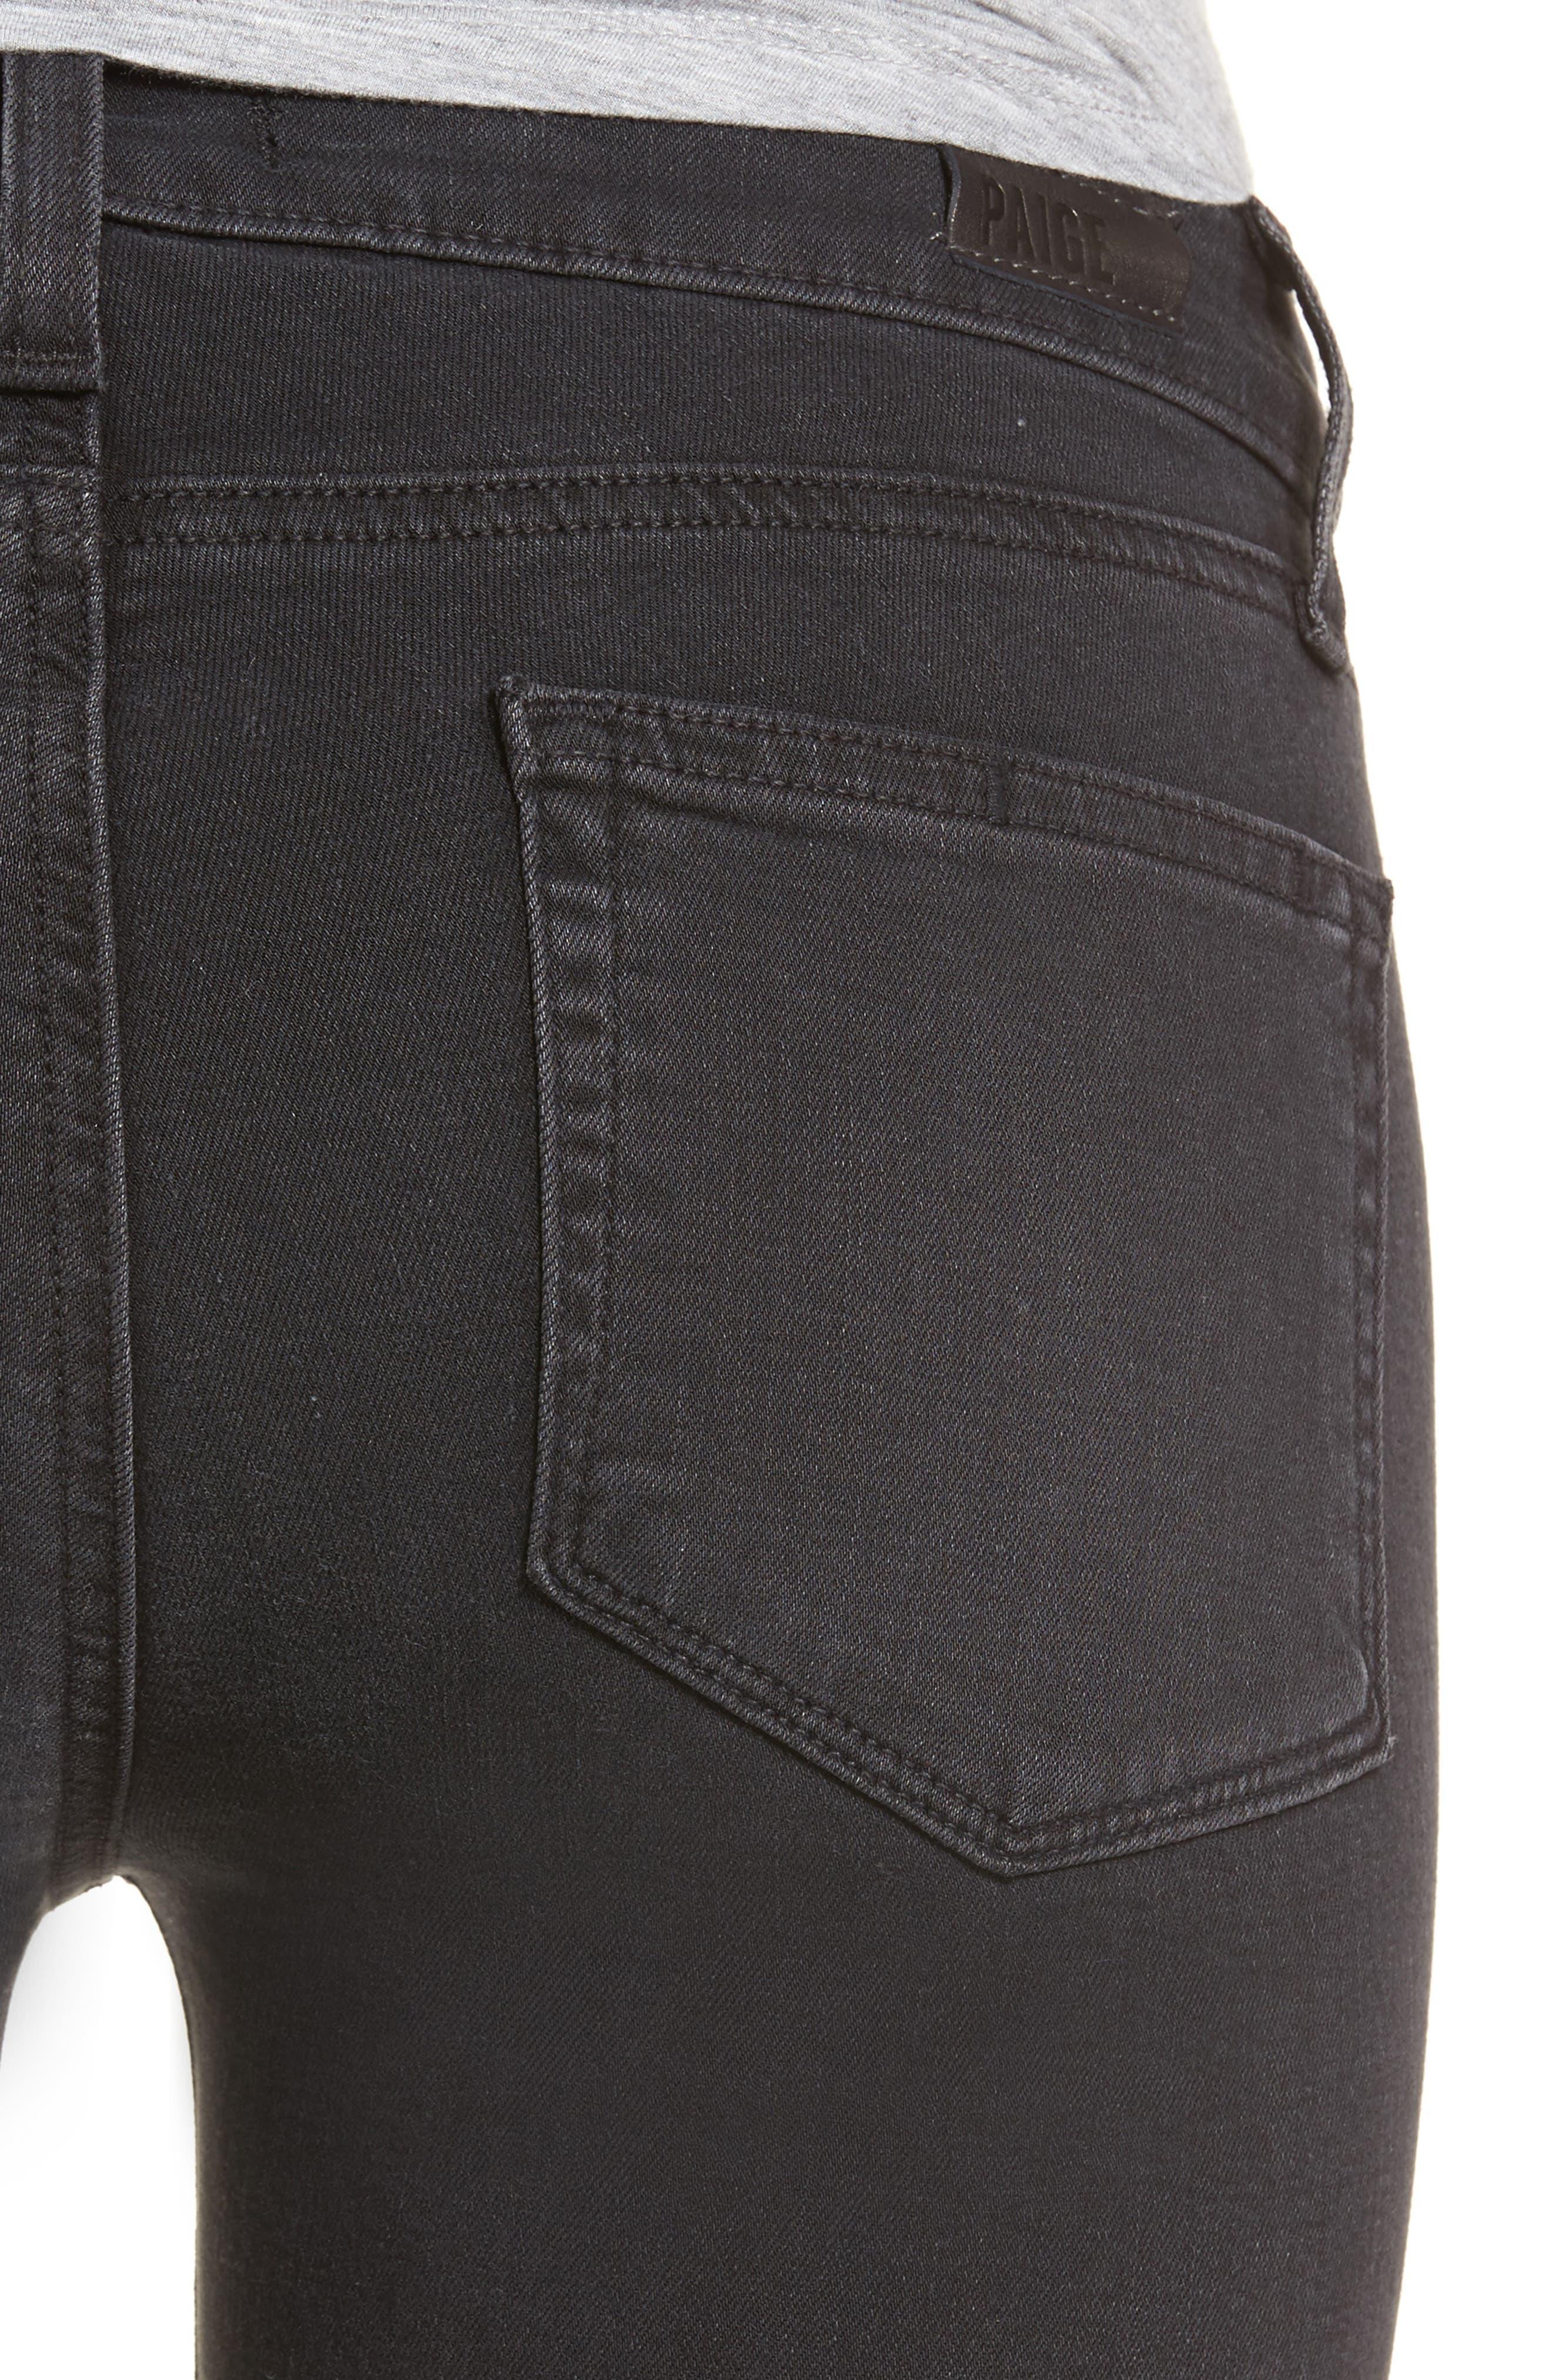 Transcend - Verdugo Ankle Skinny Jeans,                             Alternate thumbnail 4, color,                             001